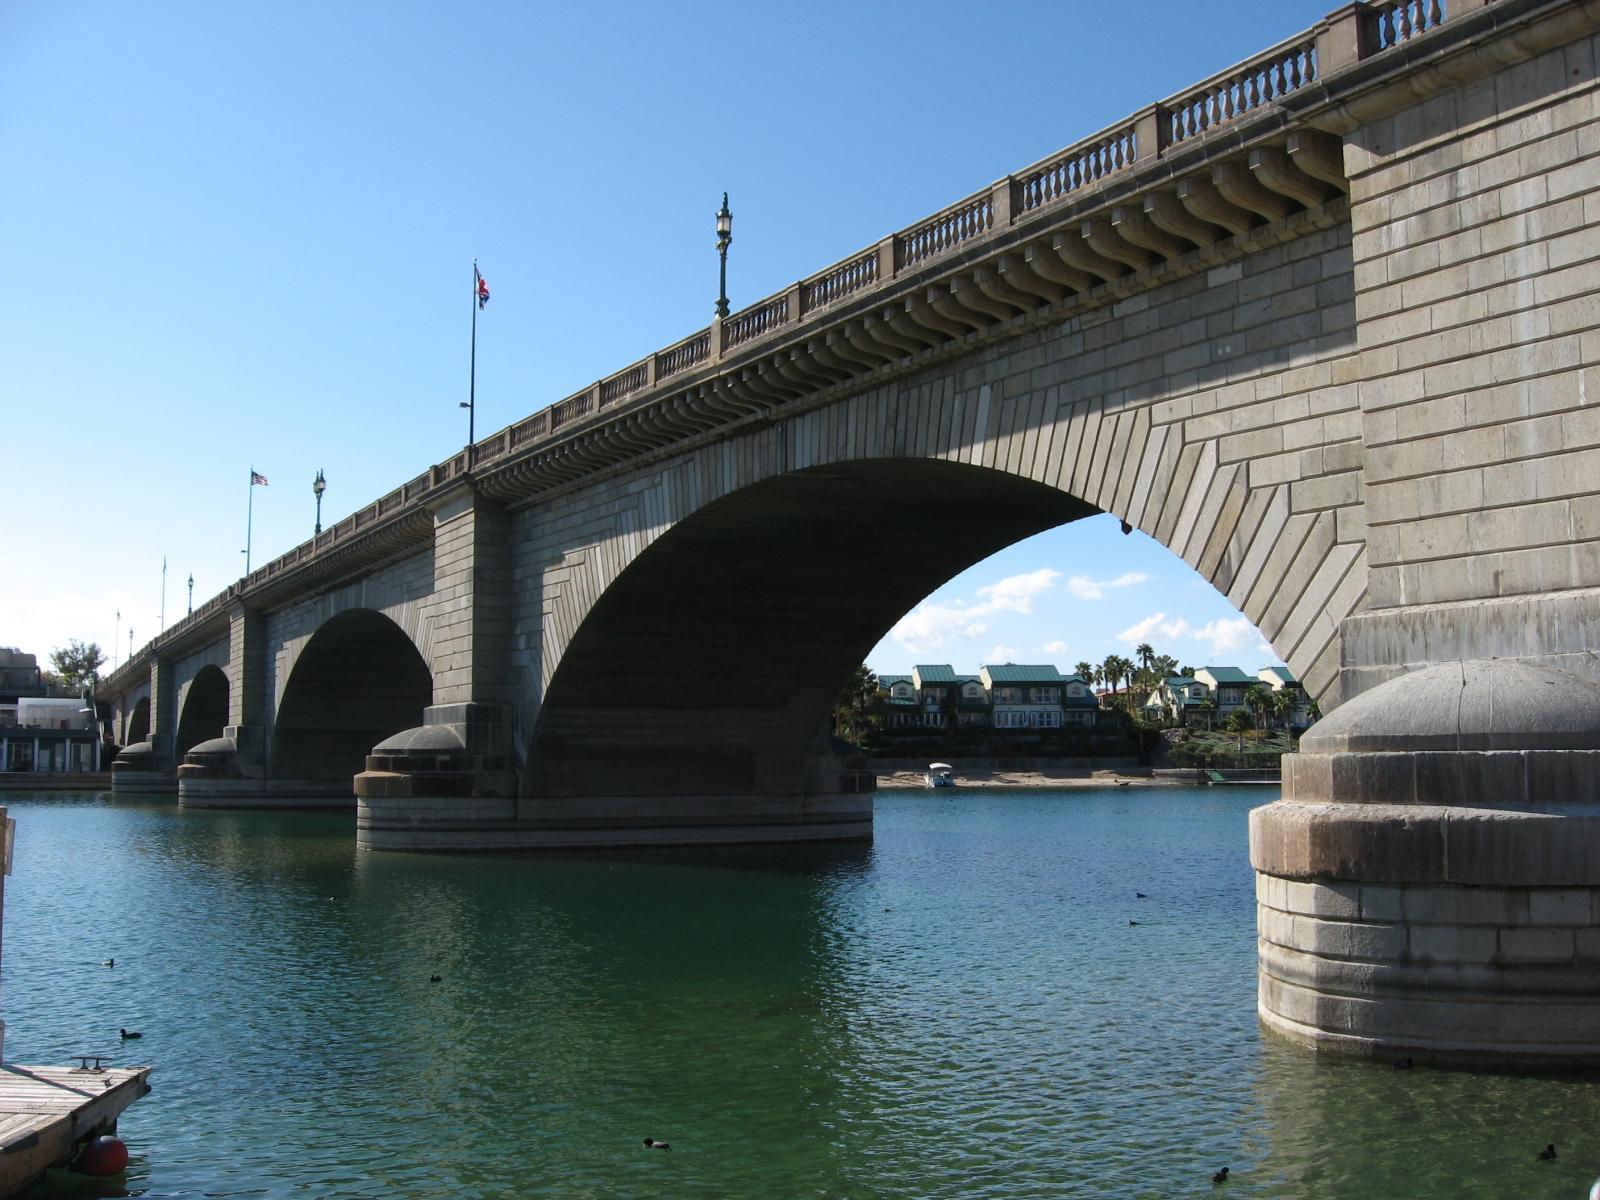 Awesome London Bridge